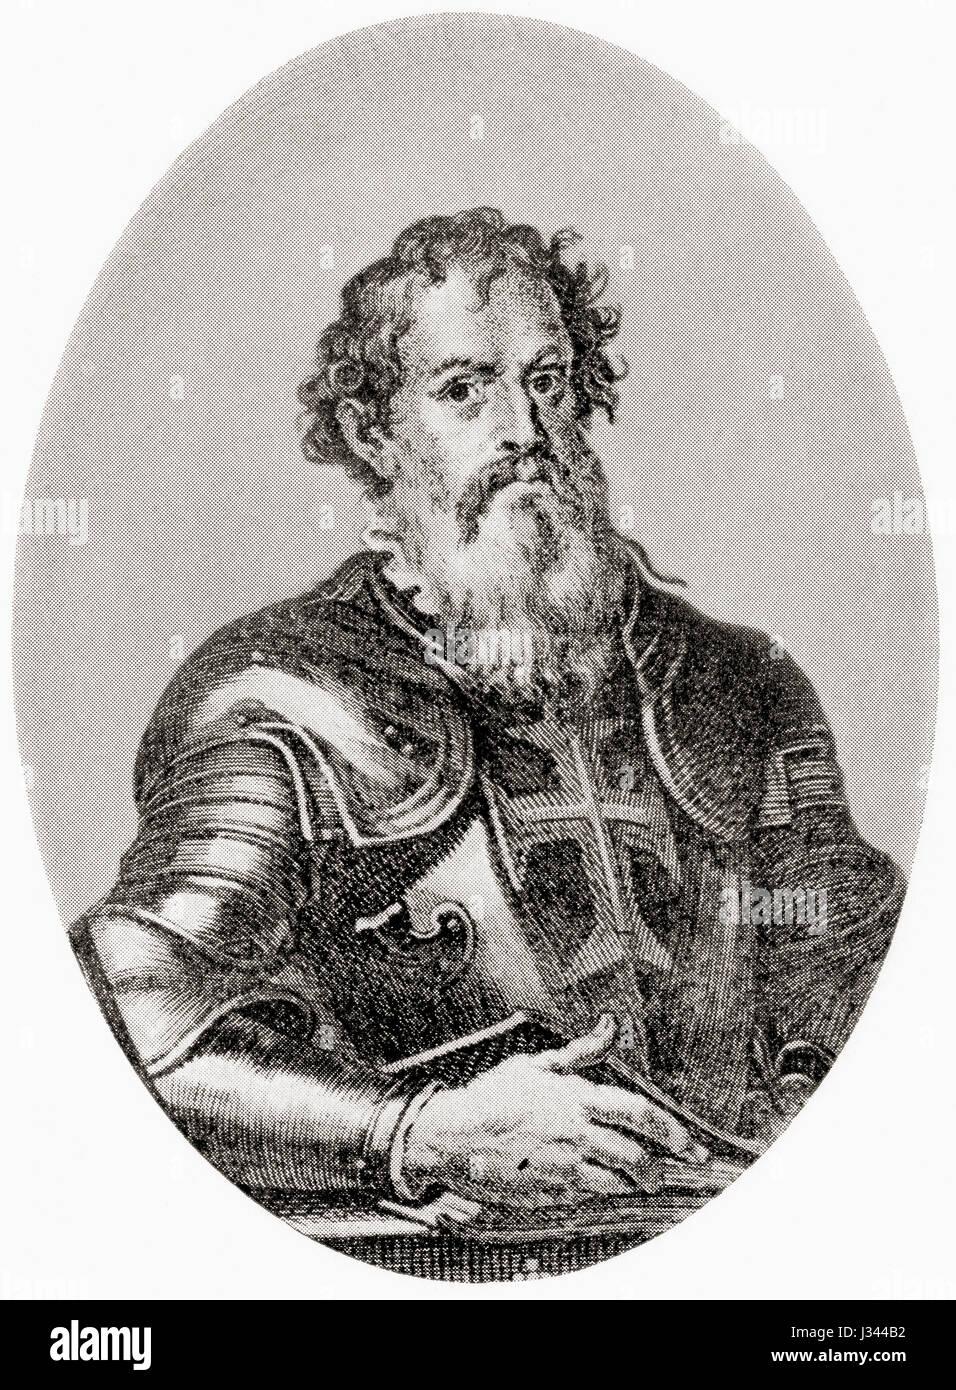 Infante D. Henrique of Portugal, Duke of Viseu, aka Prince Henry the Navigator, 1394 - 1460. Son of King João - Stock Image